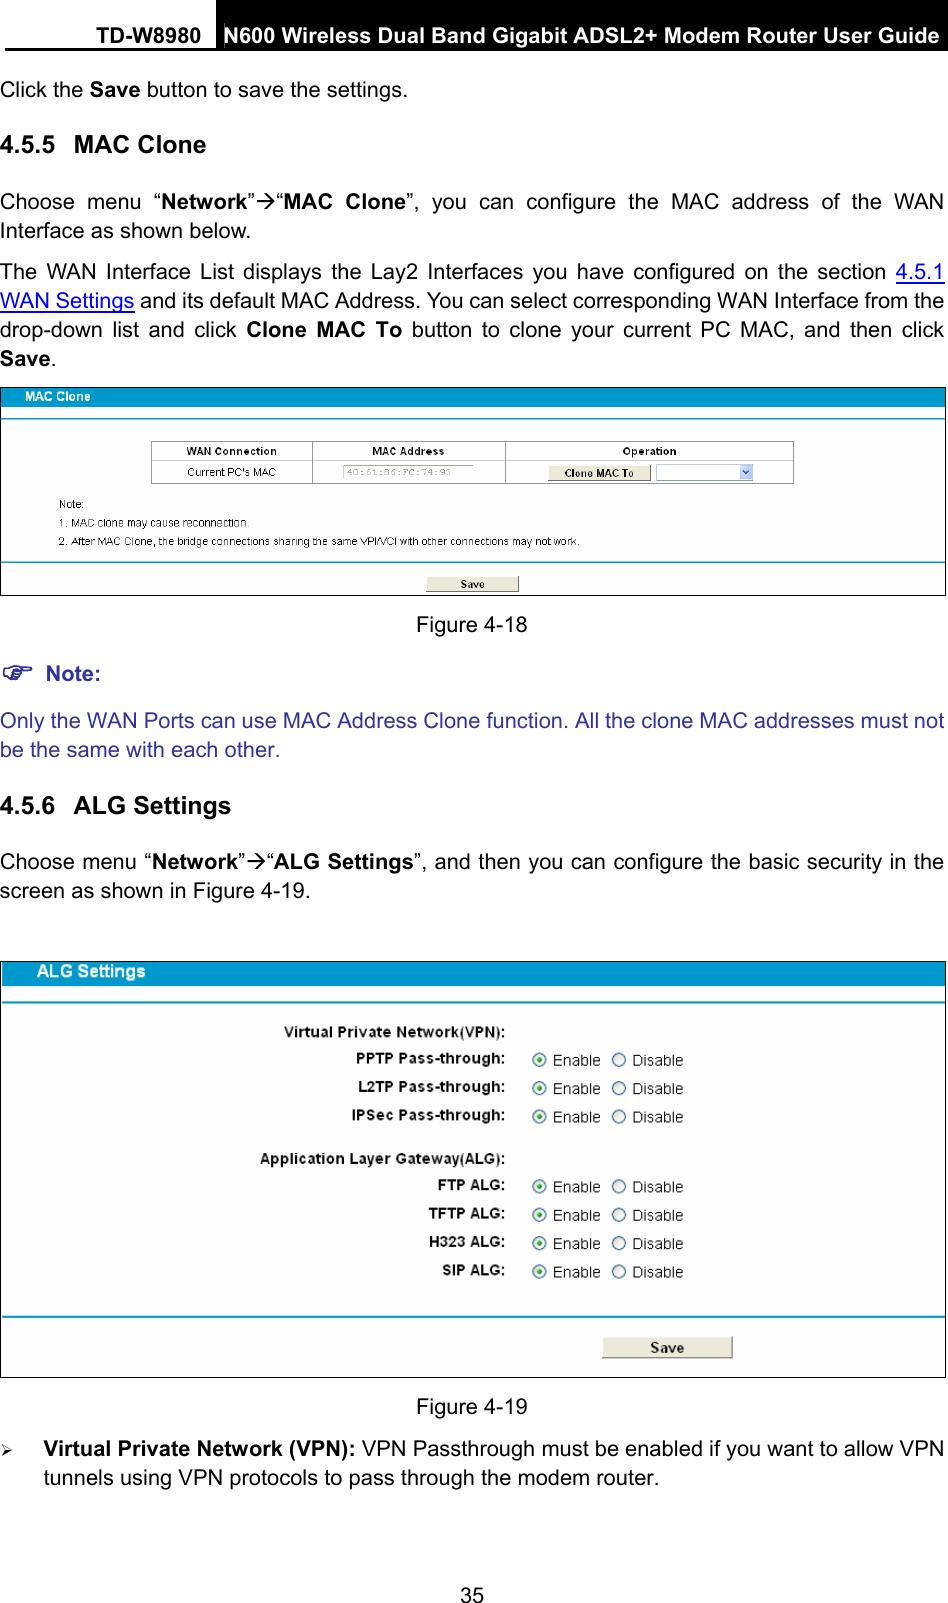 Tp Link Td W8980 User Guide